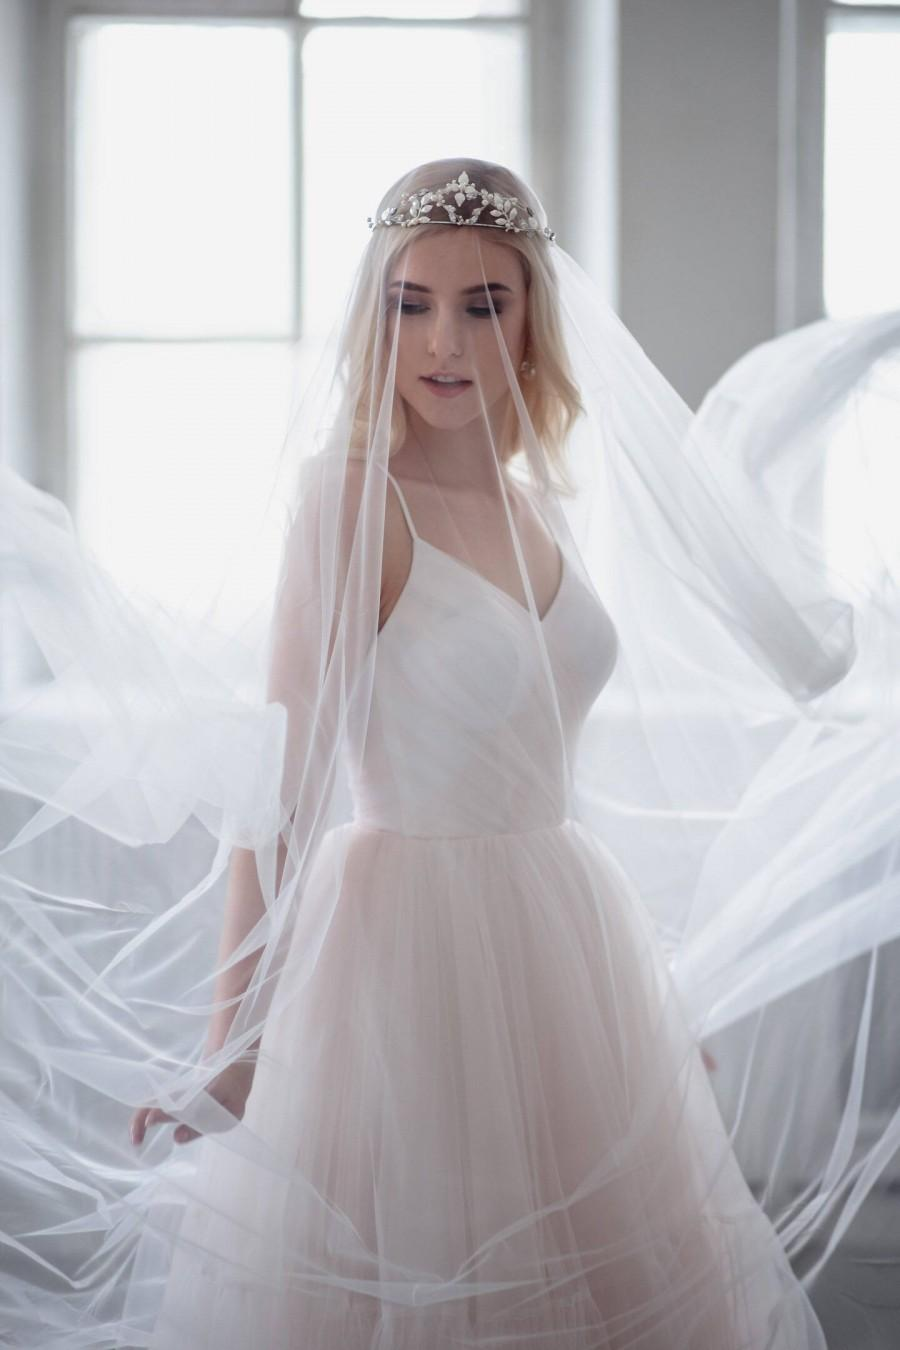 Wedding - Wedding Veil Soft Tulle Bridal Veil Simple Elegant Cathedral Veil Soft Wedding Veil One Tier White Ivory Veil Raw Edge Chapel Veil